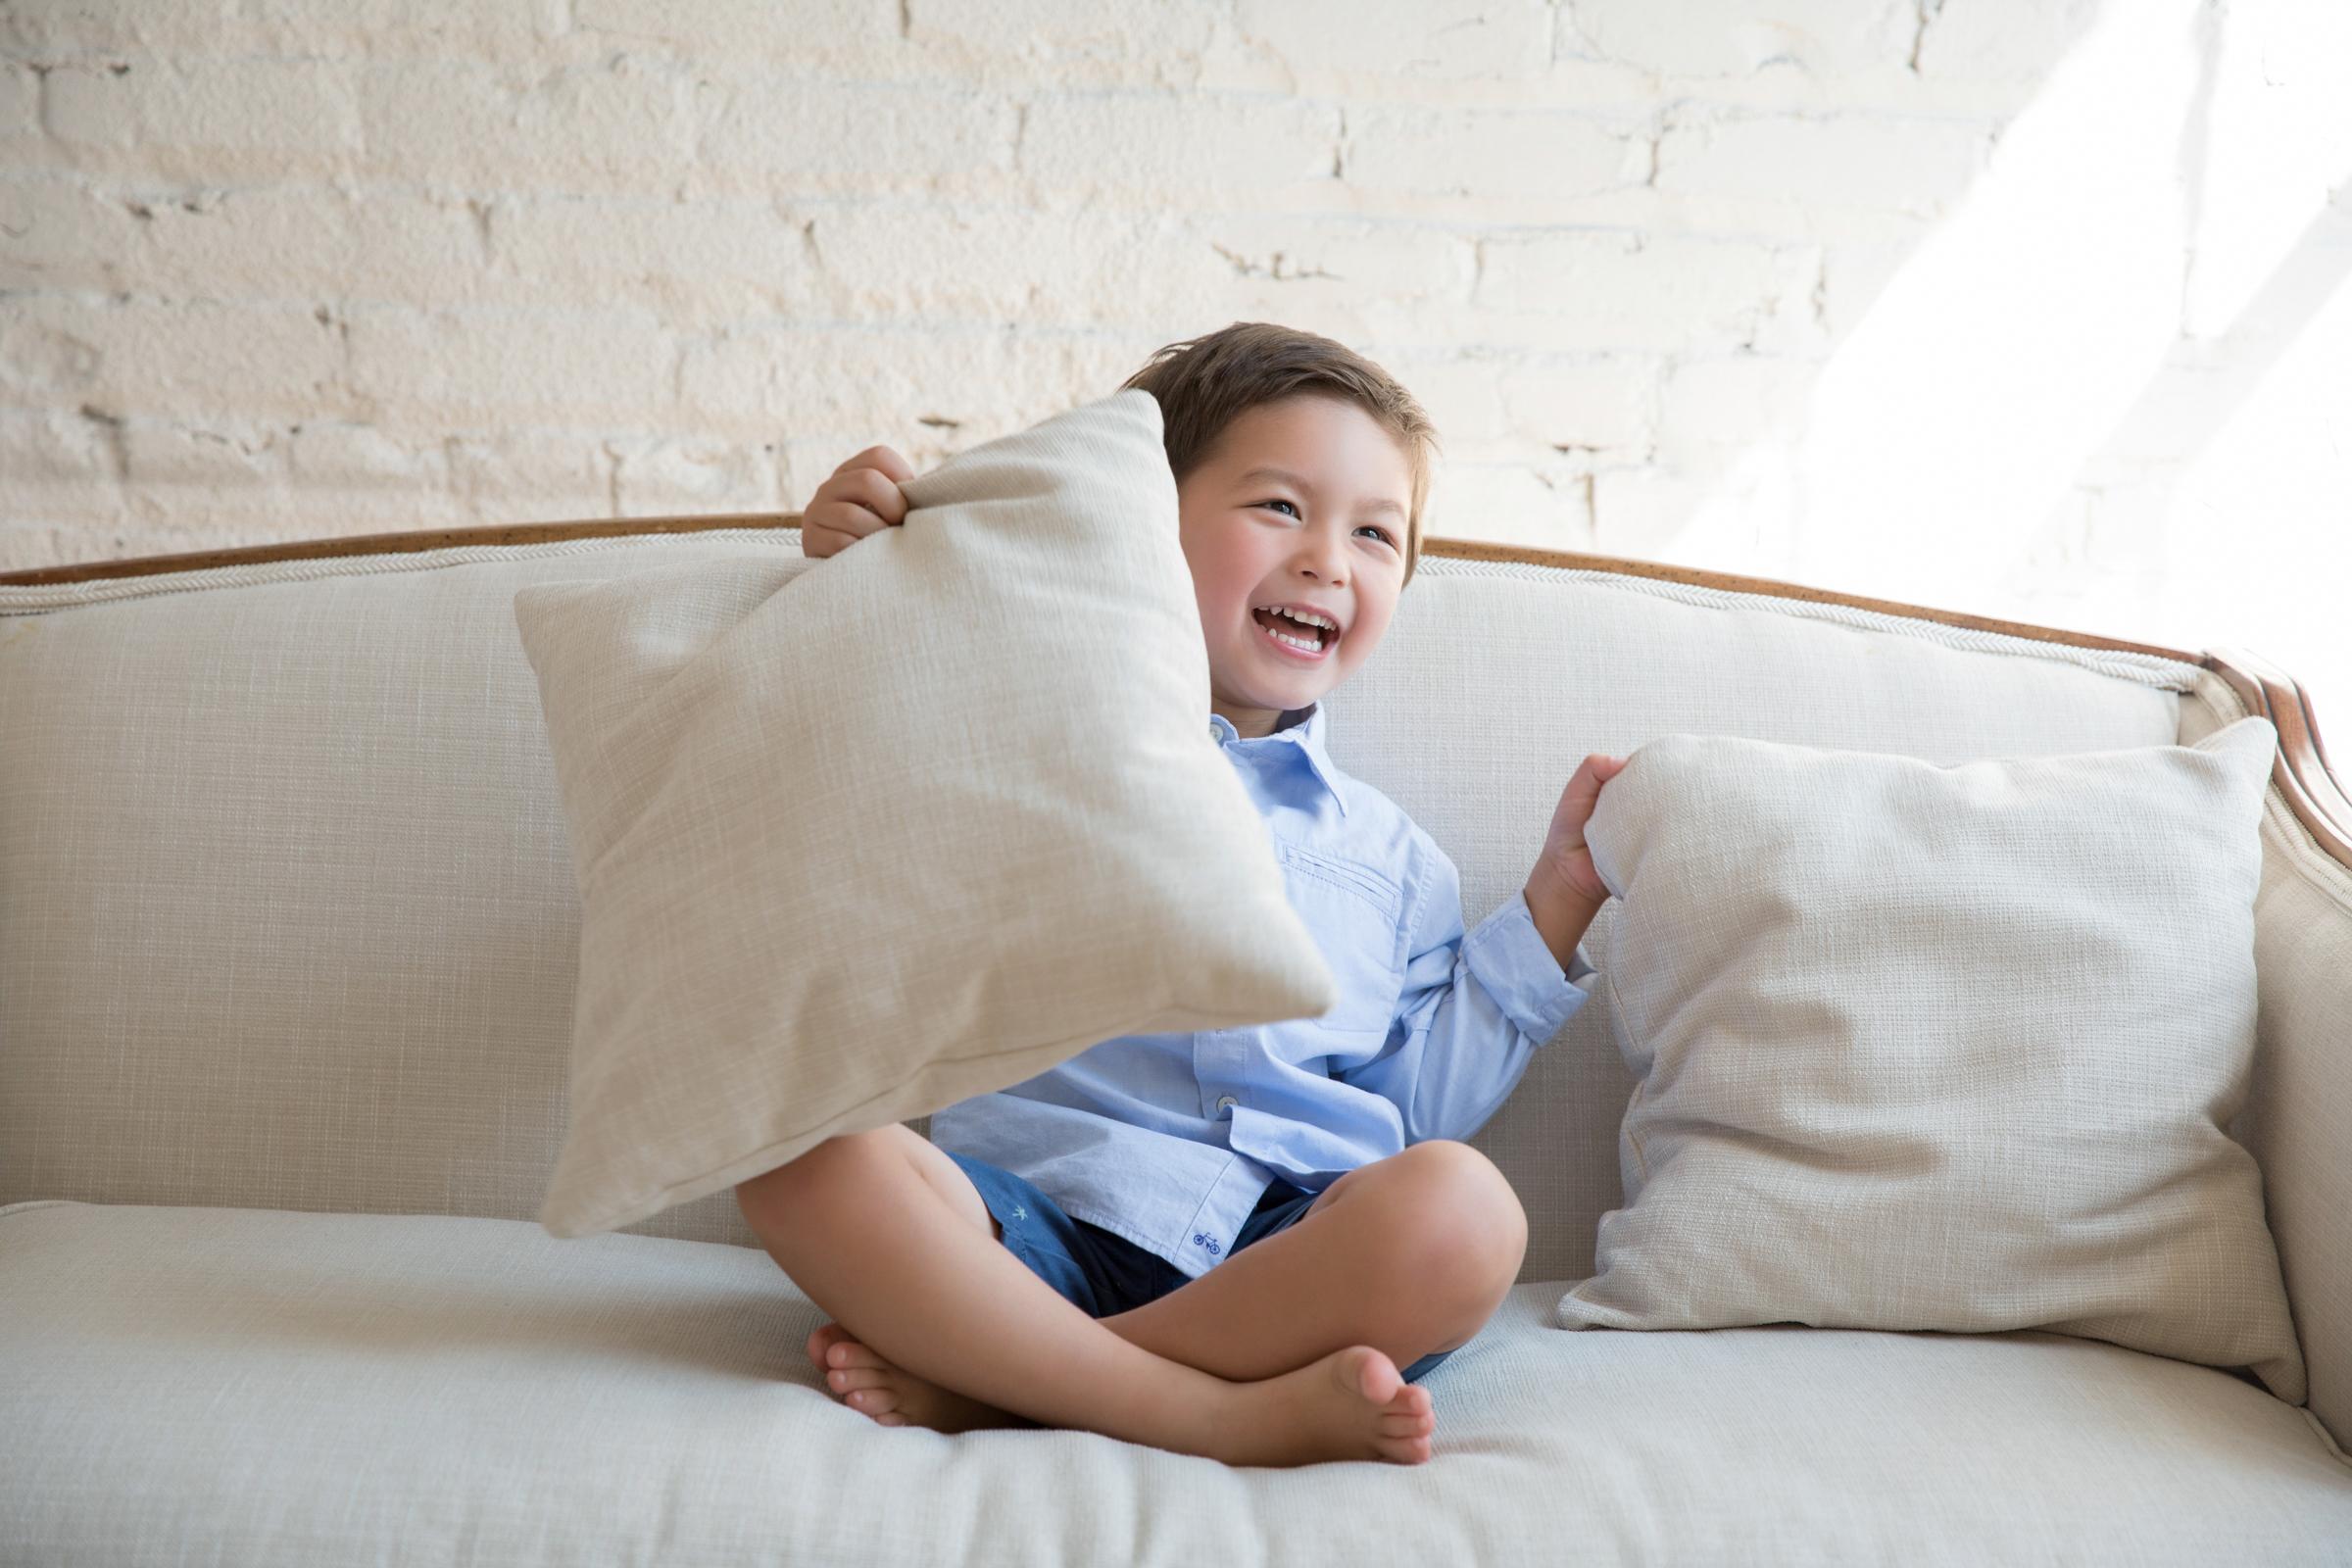 Laughing_Little_Boy.jpg